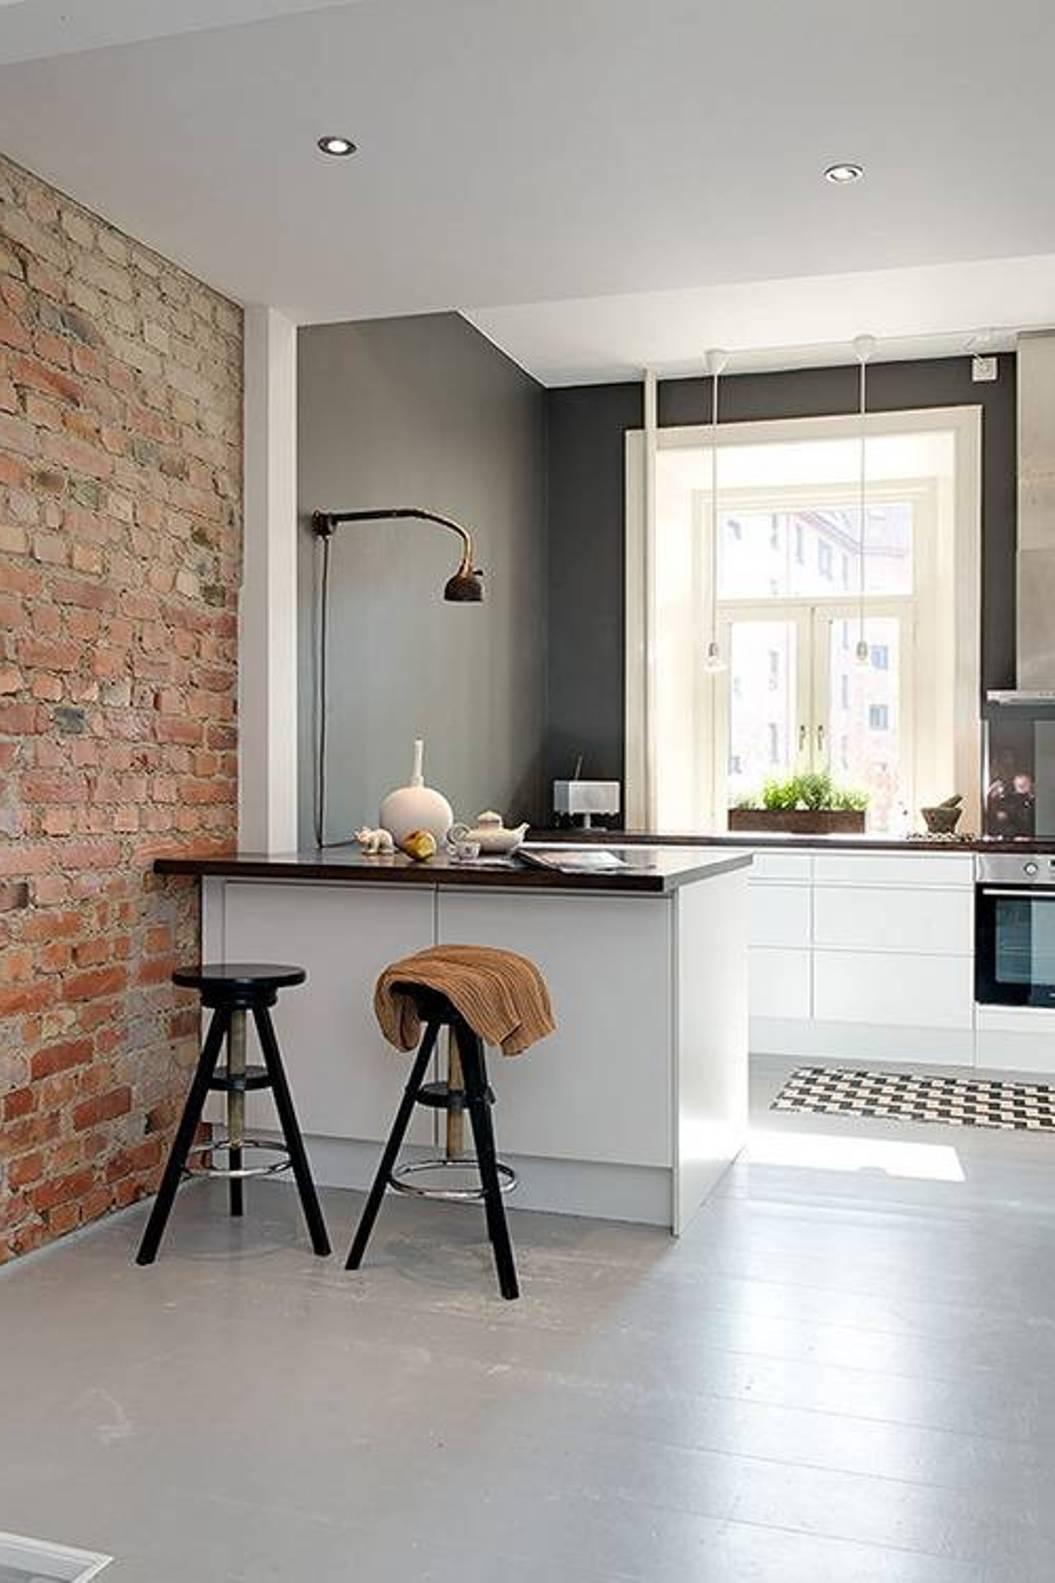 interior brick wall accent cool kitchen design idea small kitchen interior decoration kitchen interior designs